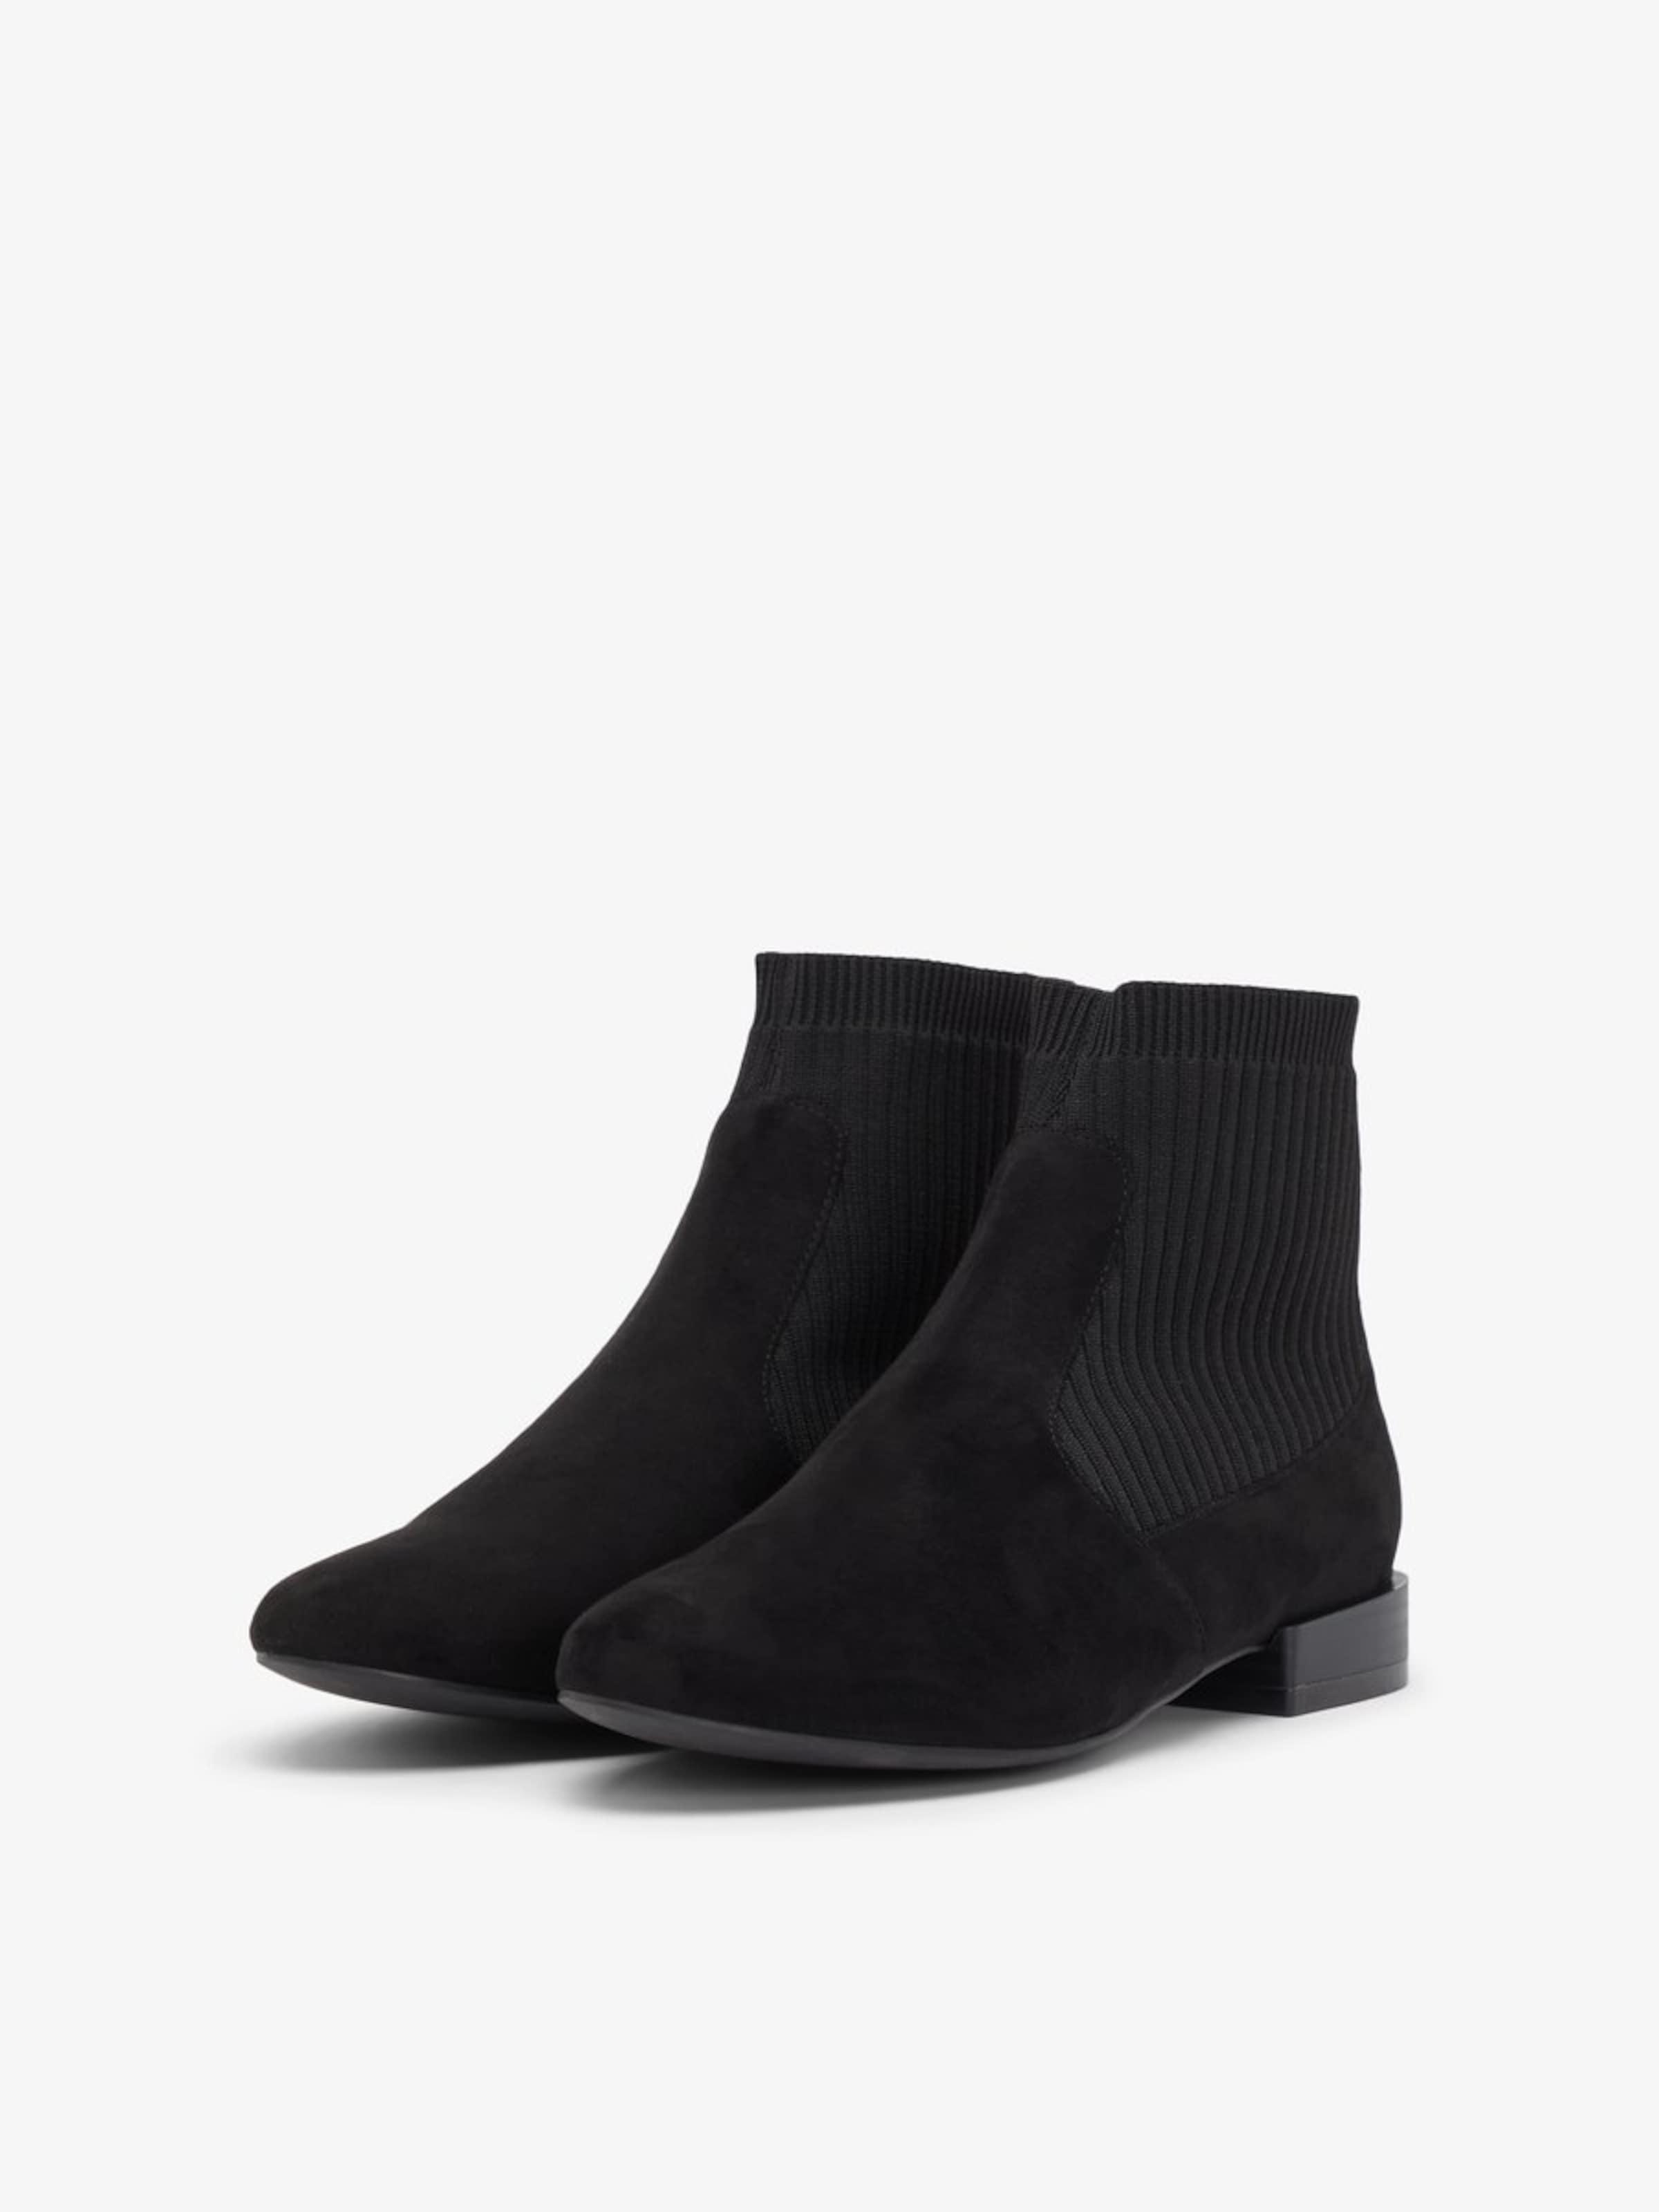 'anne' Boots Bianco Chelsea Gris En BasalteNoir SpUMqzVG